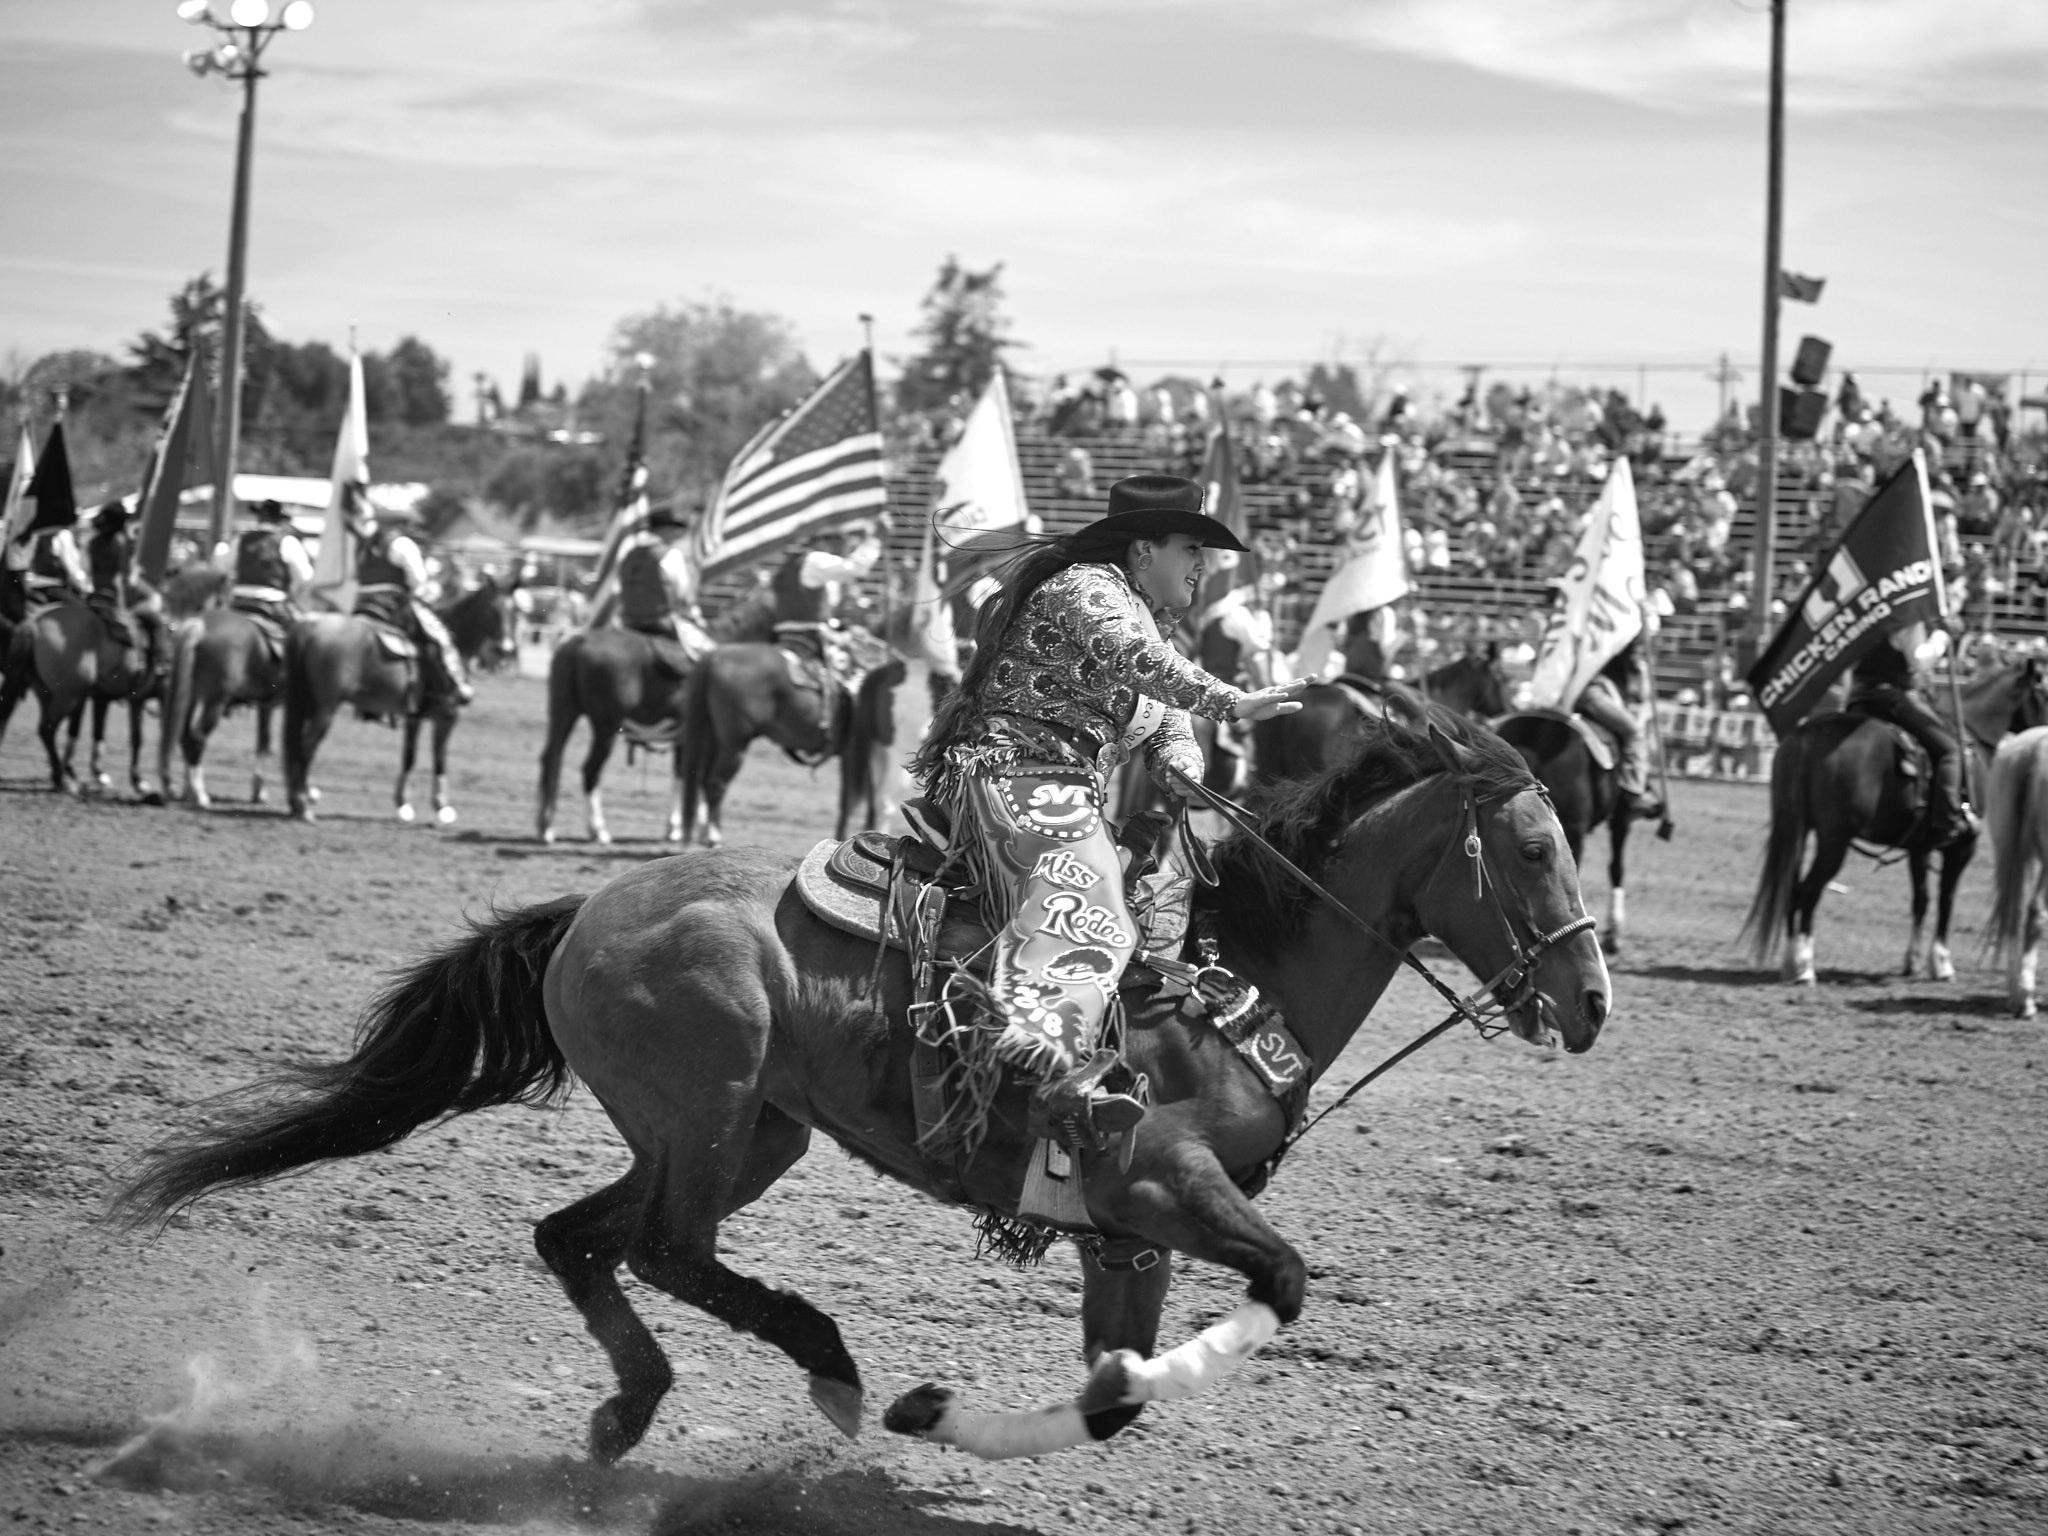 Rodeo_2019_104.jpg